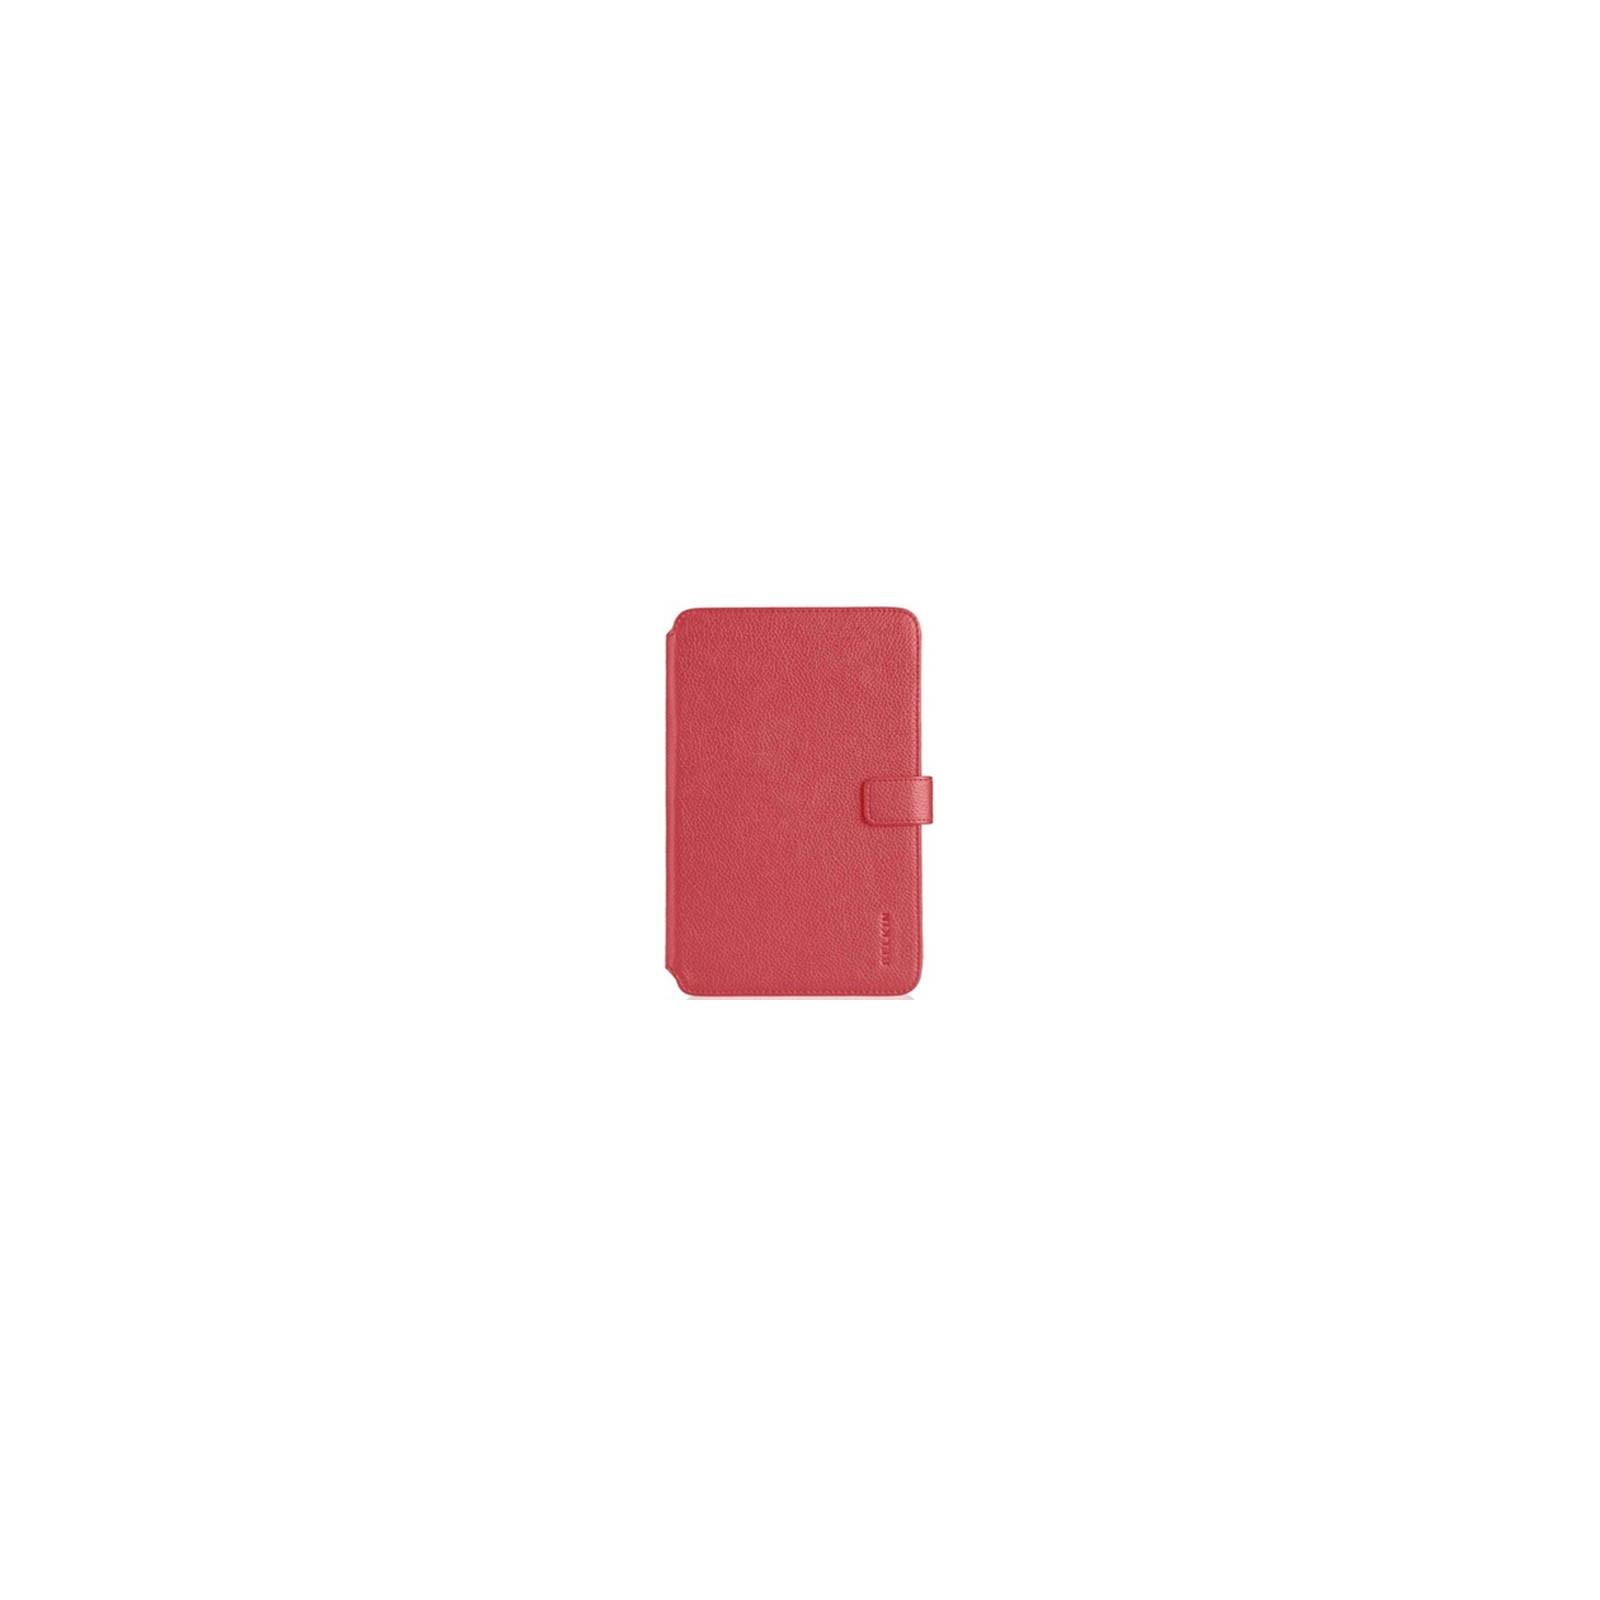 Чехол для планшета Belkin 7 Universal, Verve Tab Folio (F8N675cwC01)